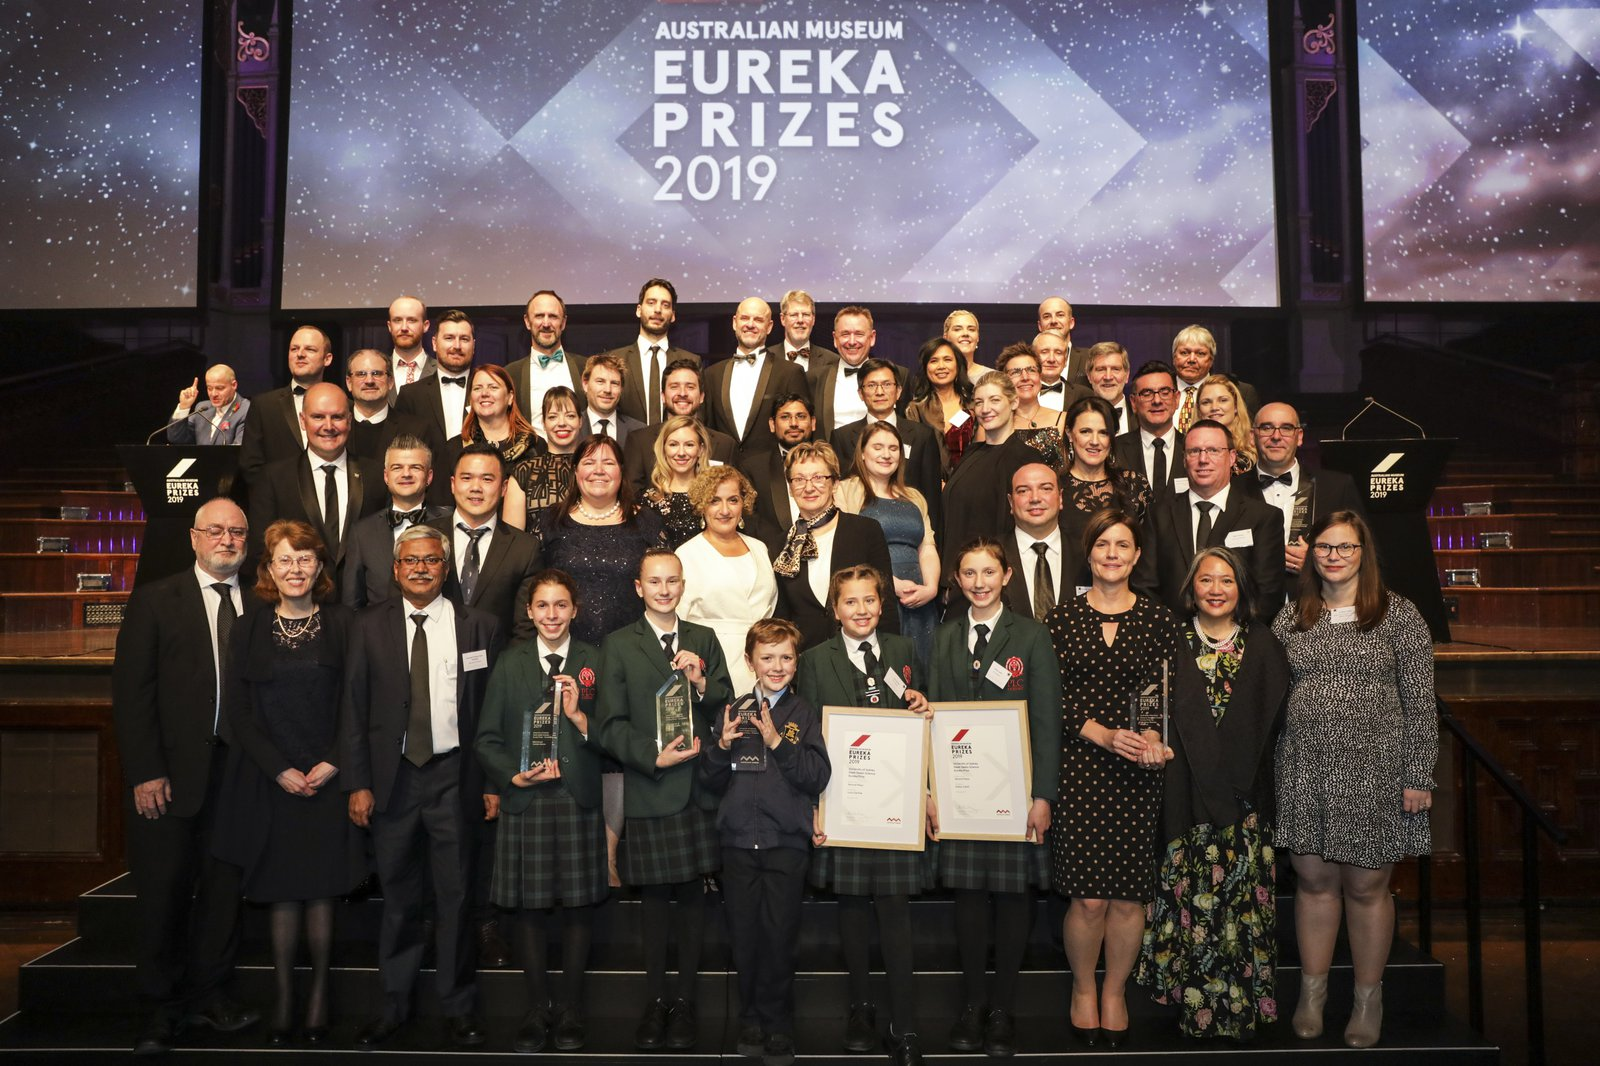 2019 Australian Museum Eureka Prizes winners announced